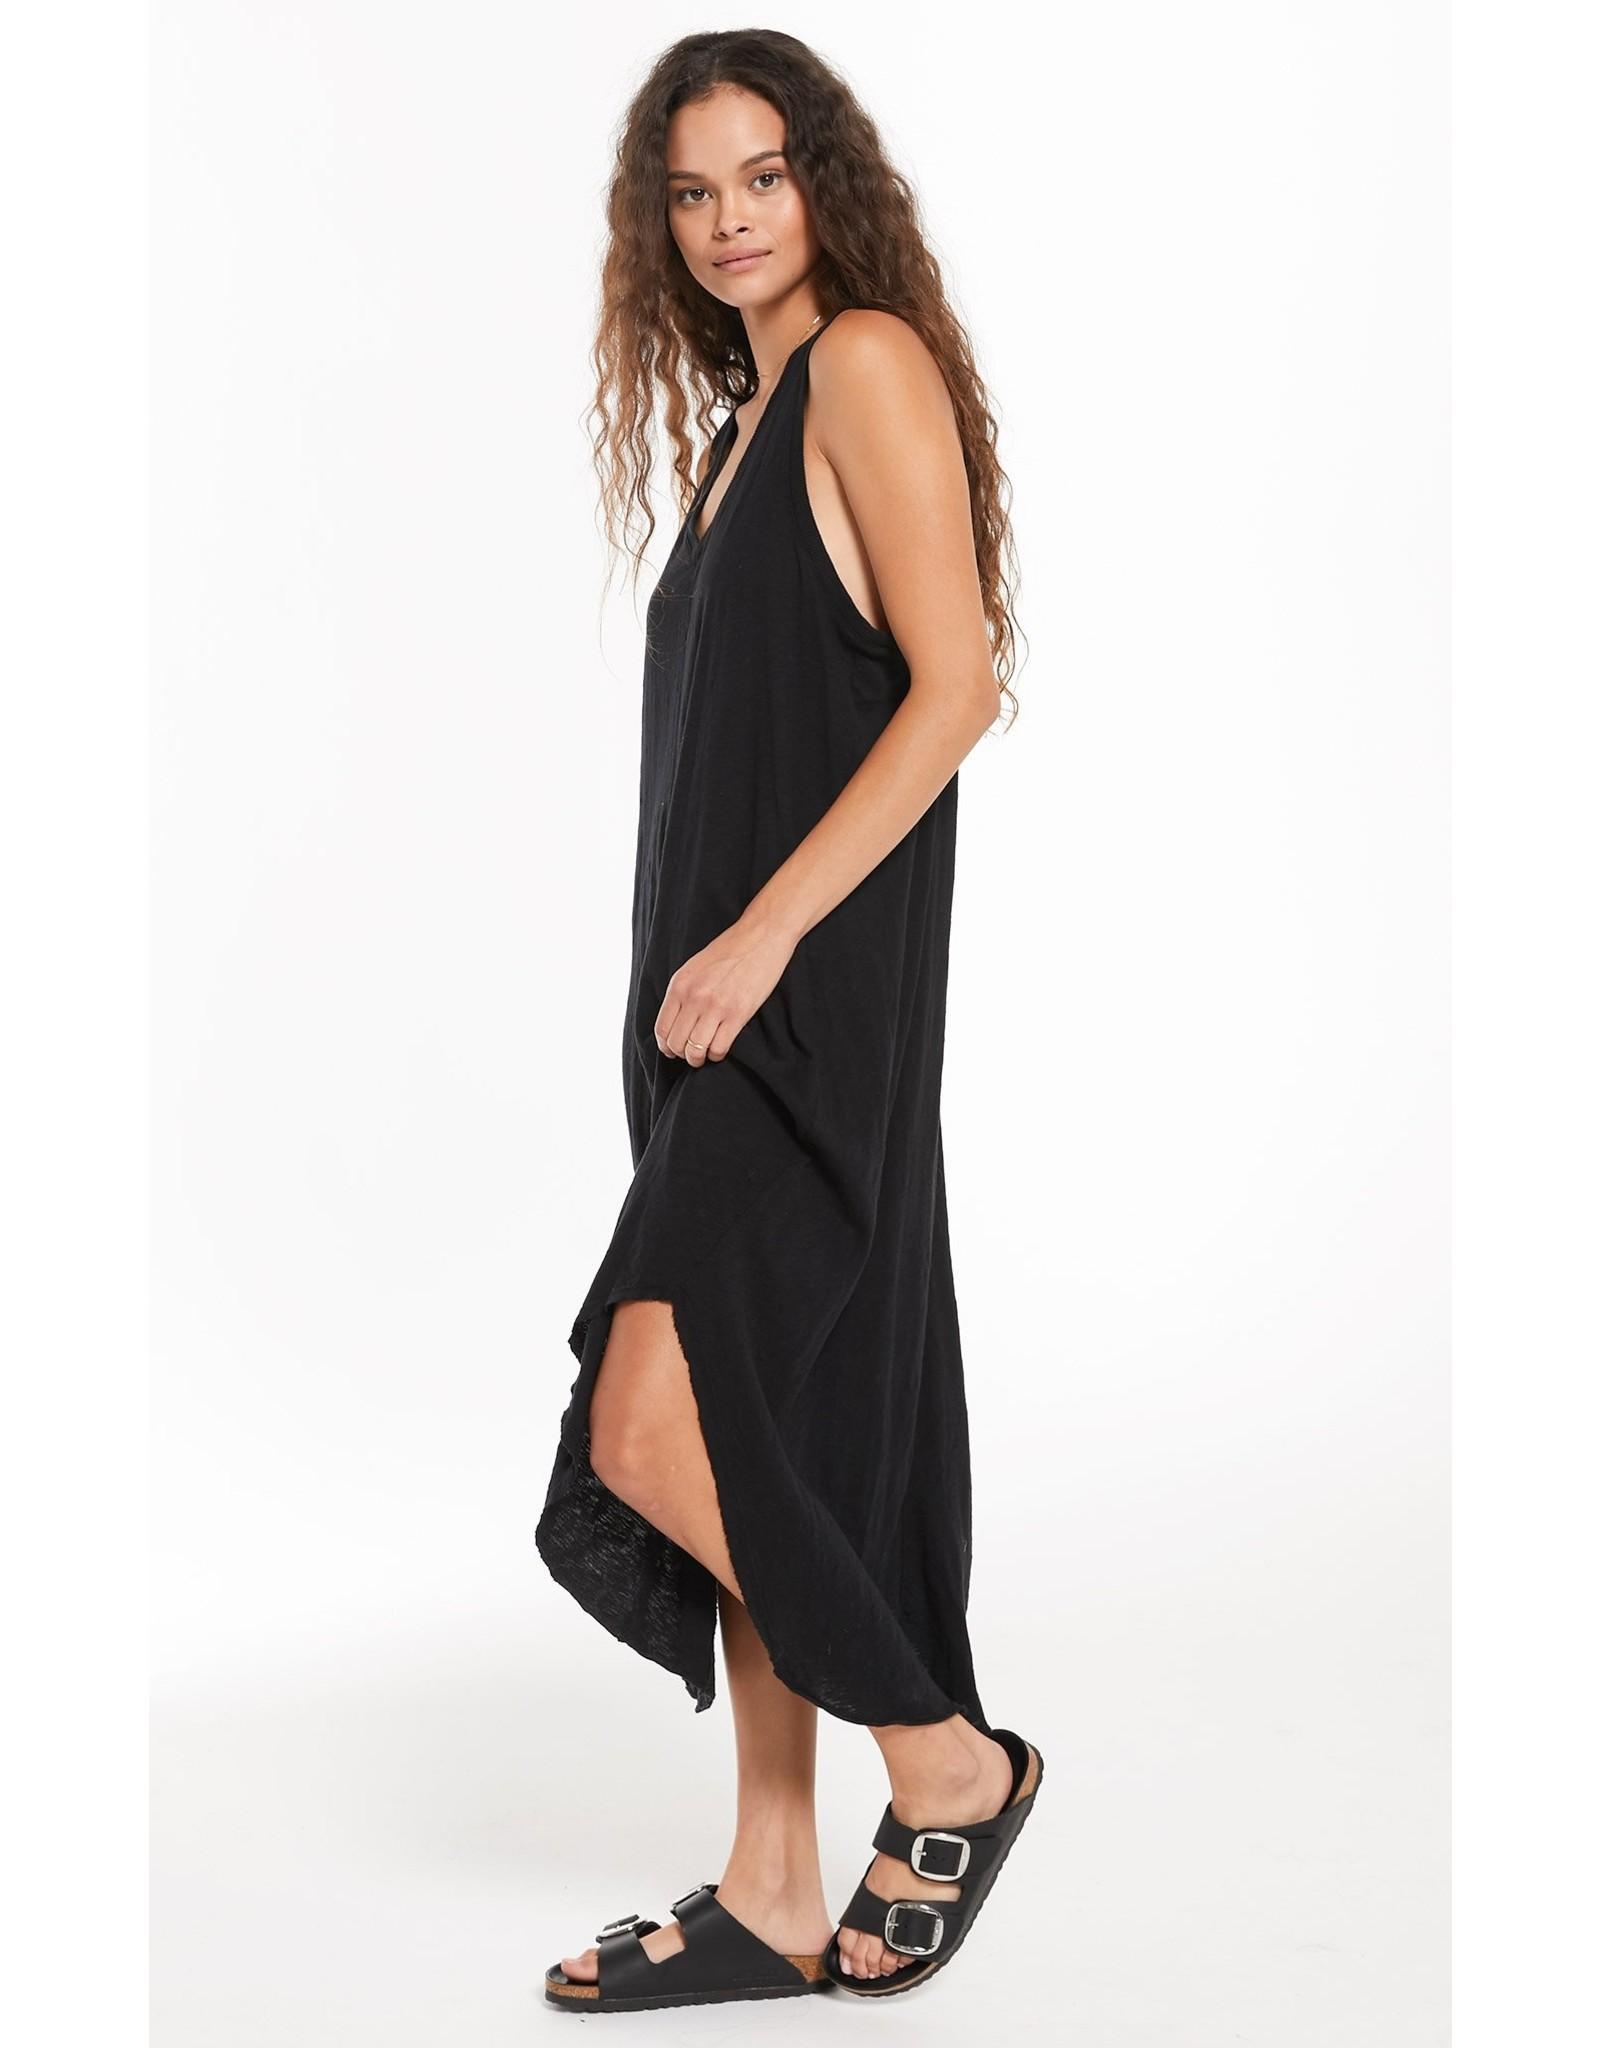 Z Supply Z SUPPLY The Reverie Dress